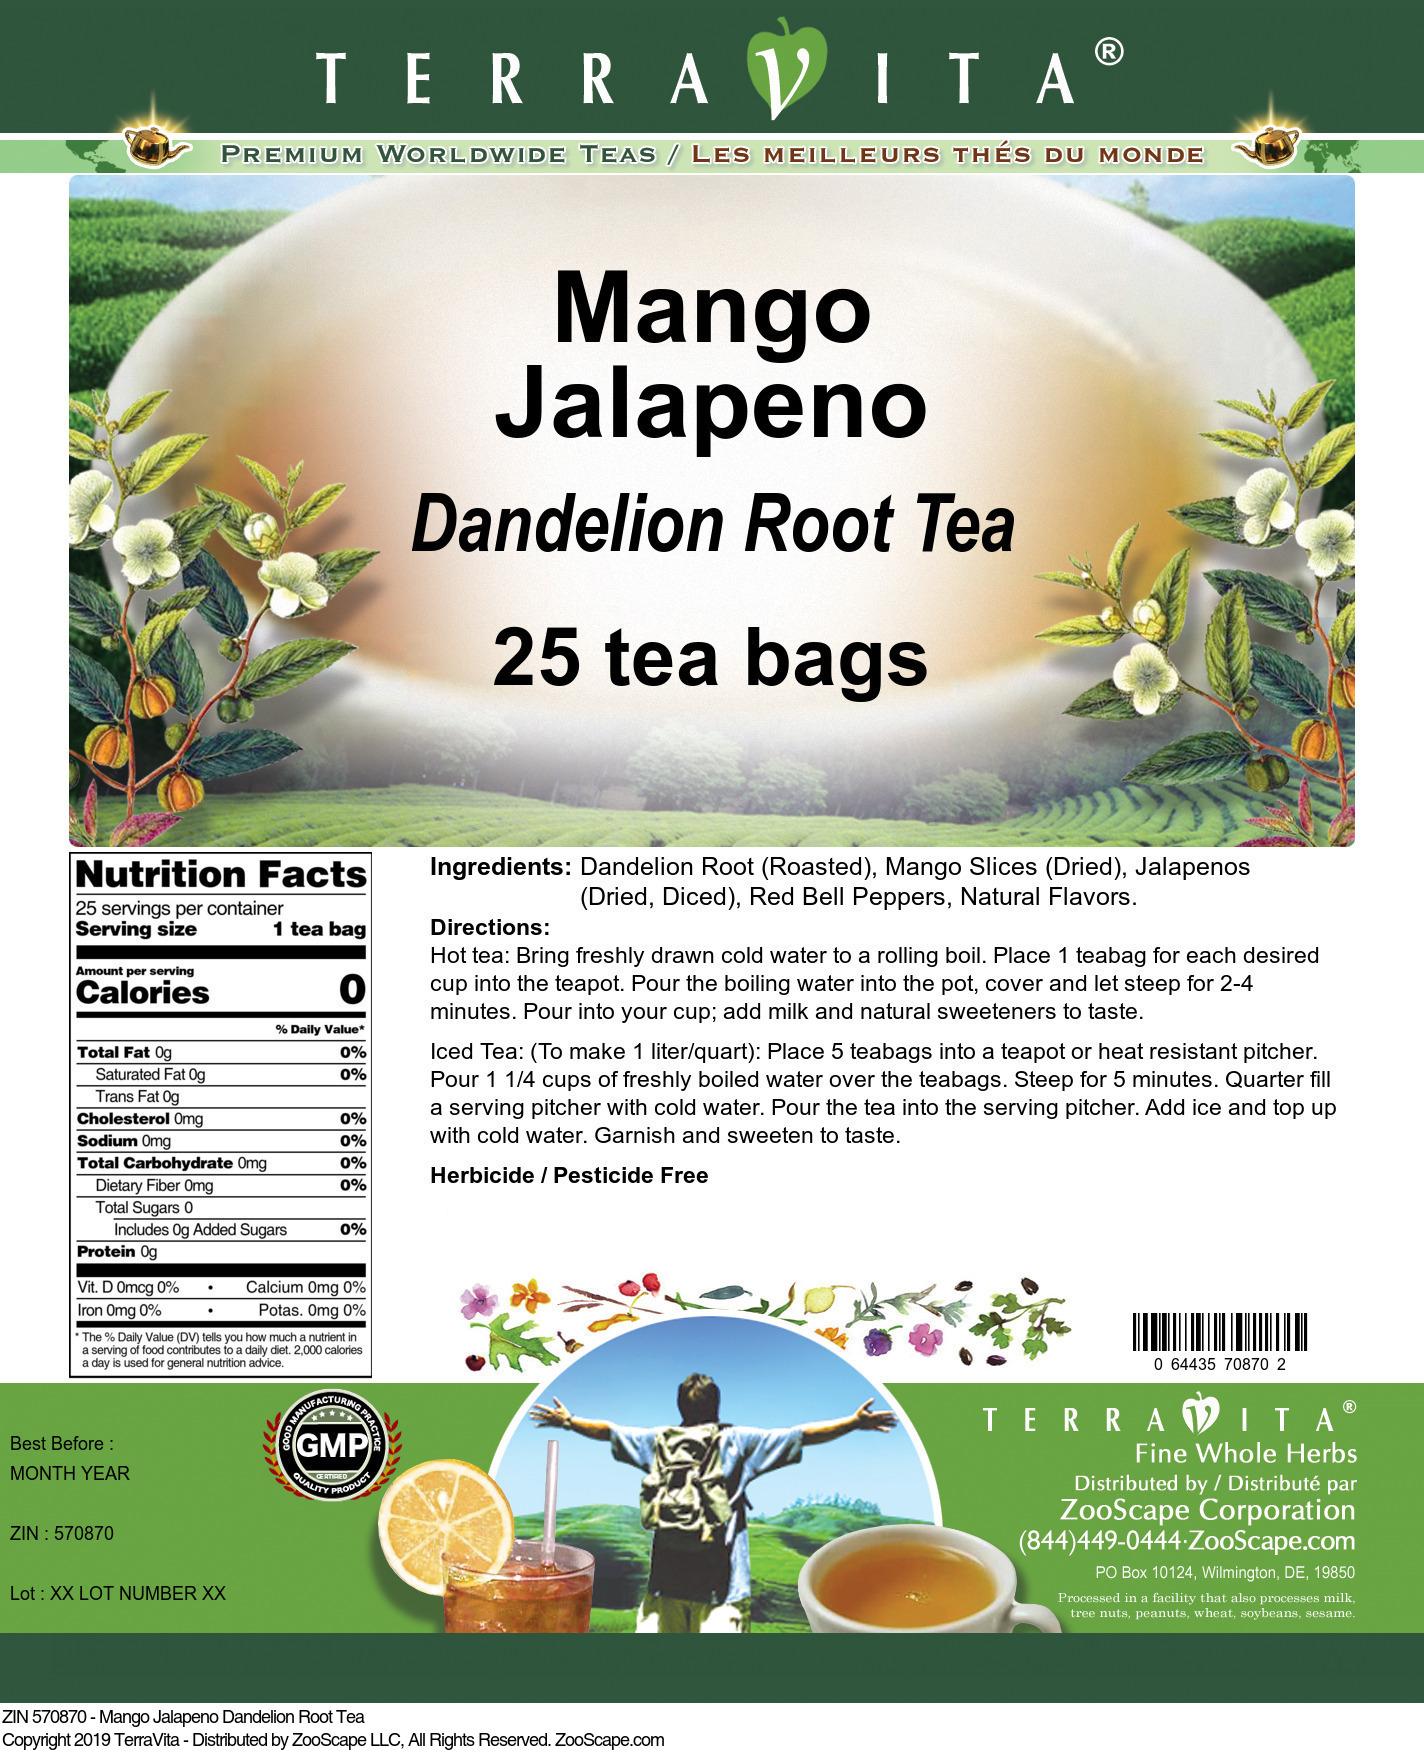 Mango Jalapeno Dandelion Root Tea